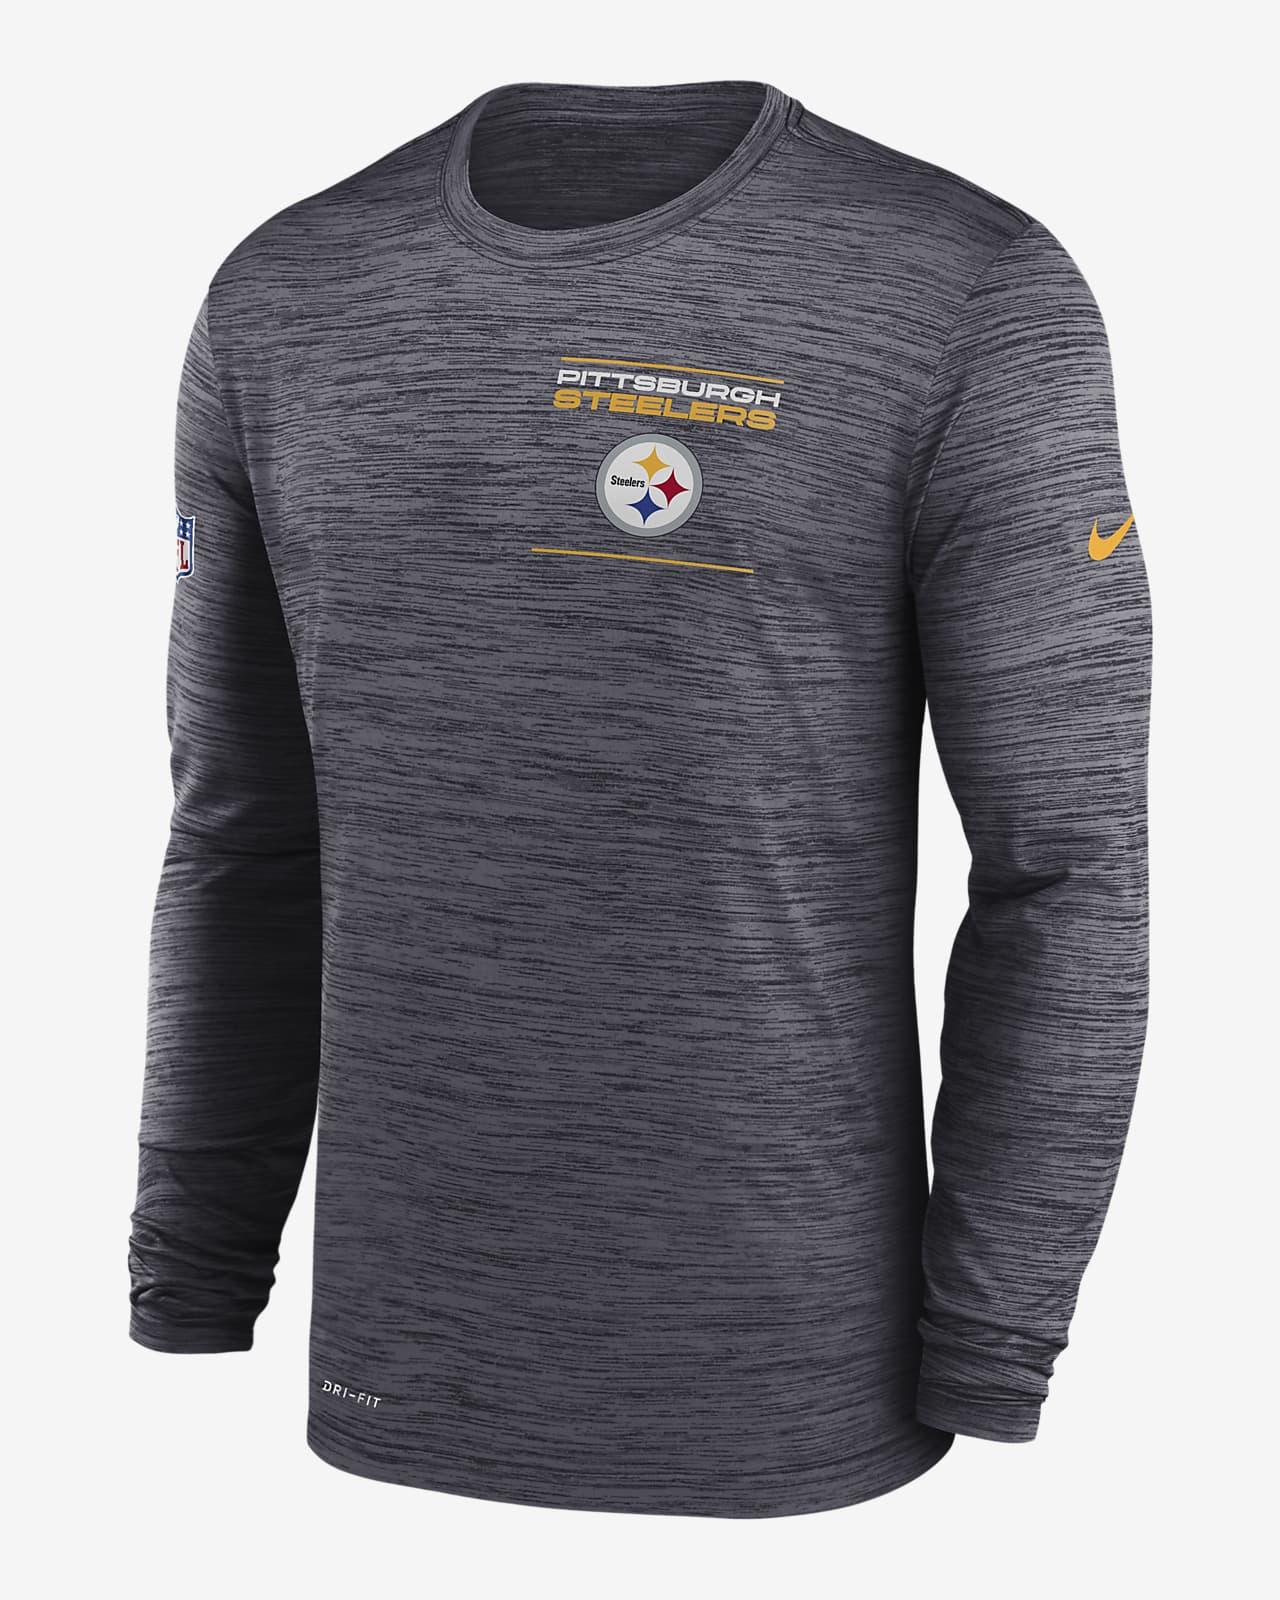 Nike Dri-FIT Sideline Velocity Legend (NFL Pittsburgh Steelers) Men's Long-Sleeve T-Shirt